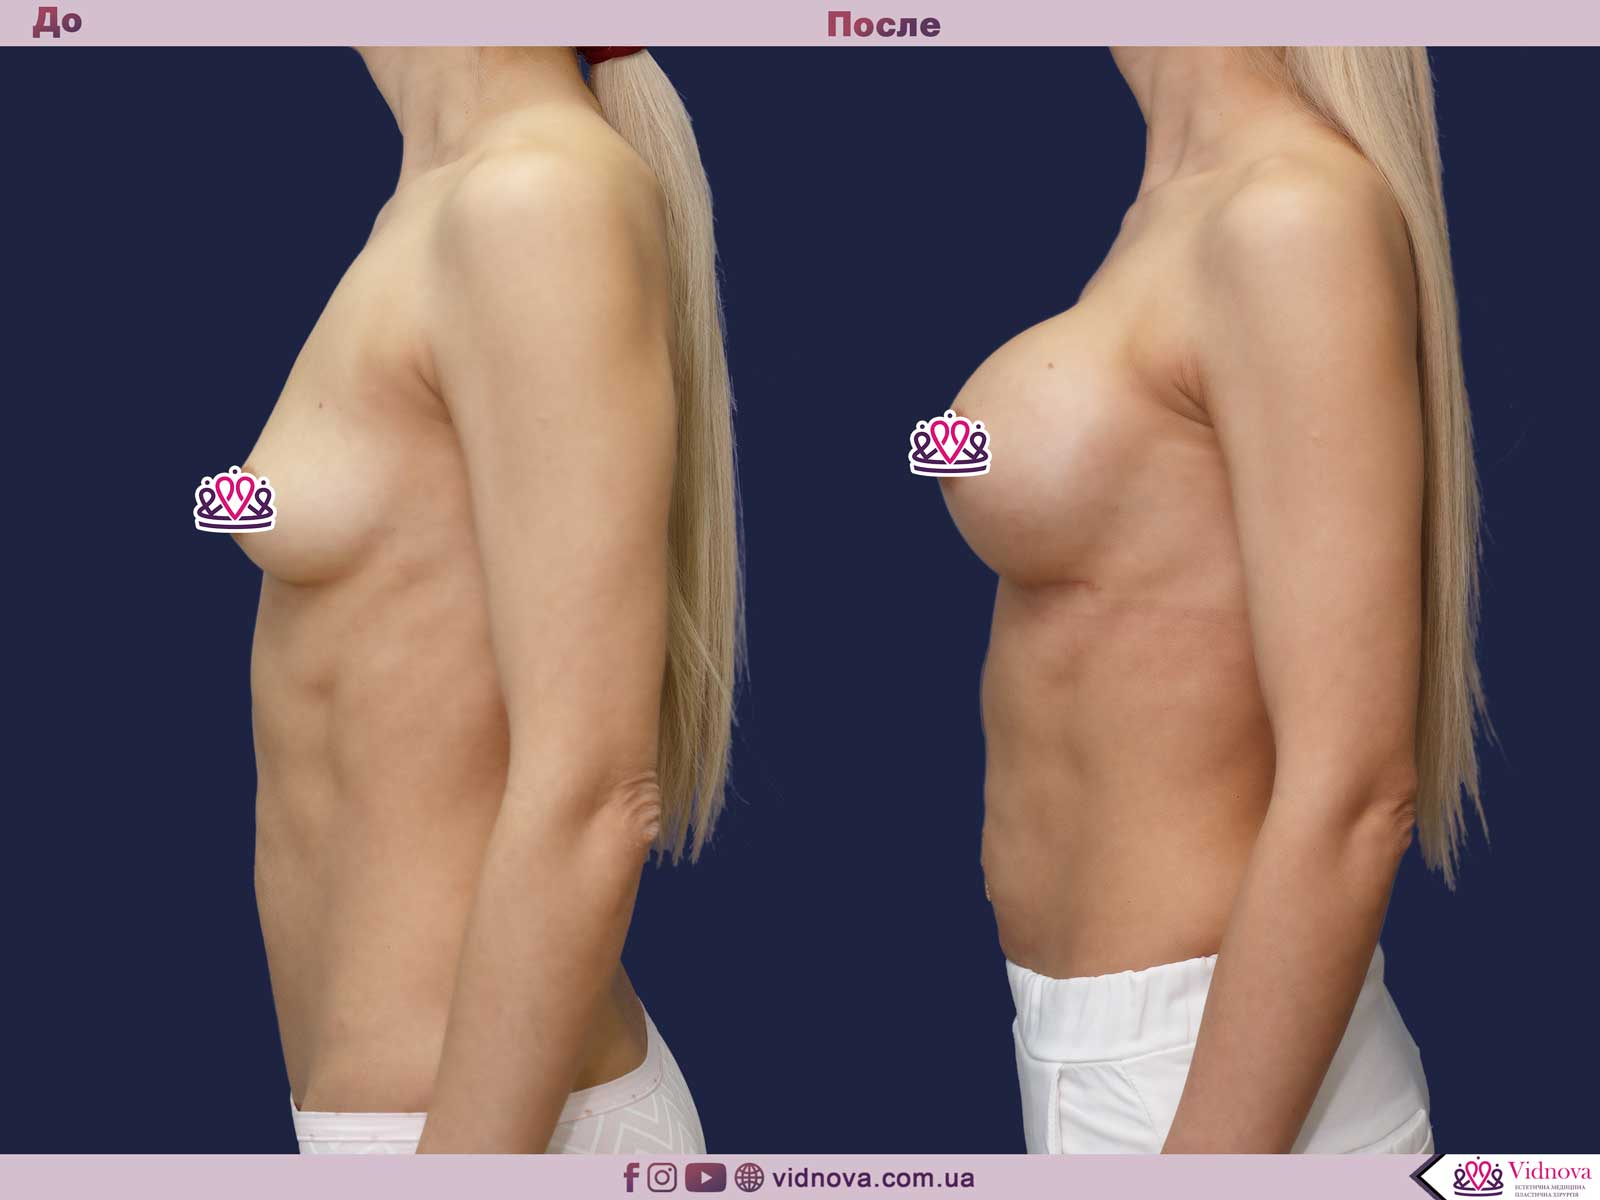 Увеличение груди: Фото ДО и ПОСЛЕ - Пример №63-3 - Клиника Vidnova